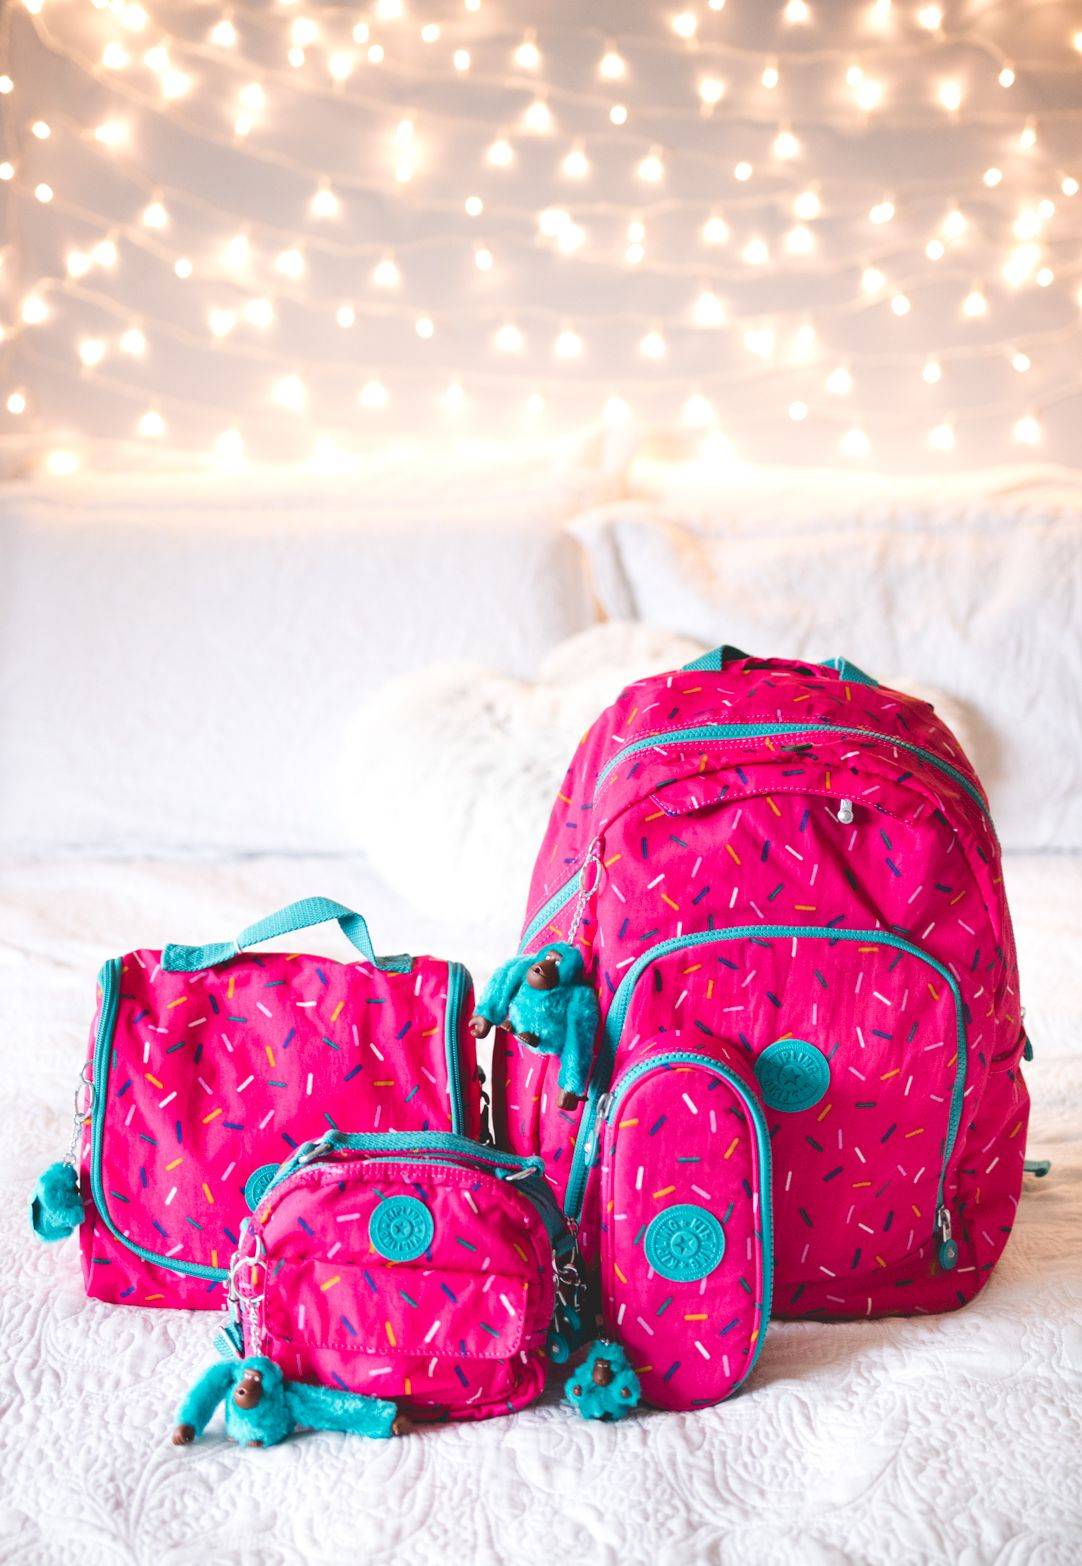 9eb992f6d Pin de Rocio Arraras em mochilas | Carteras escolares, Bolsos ...